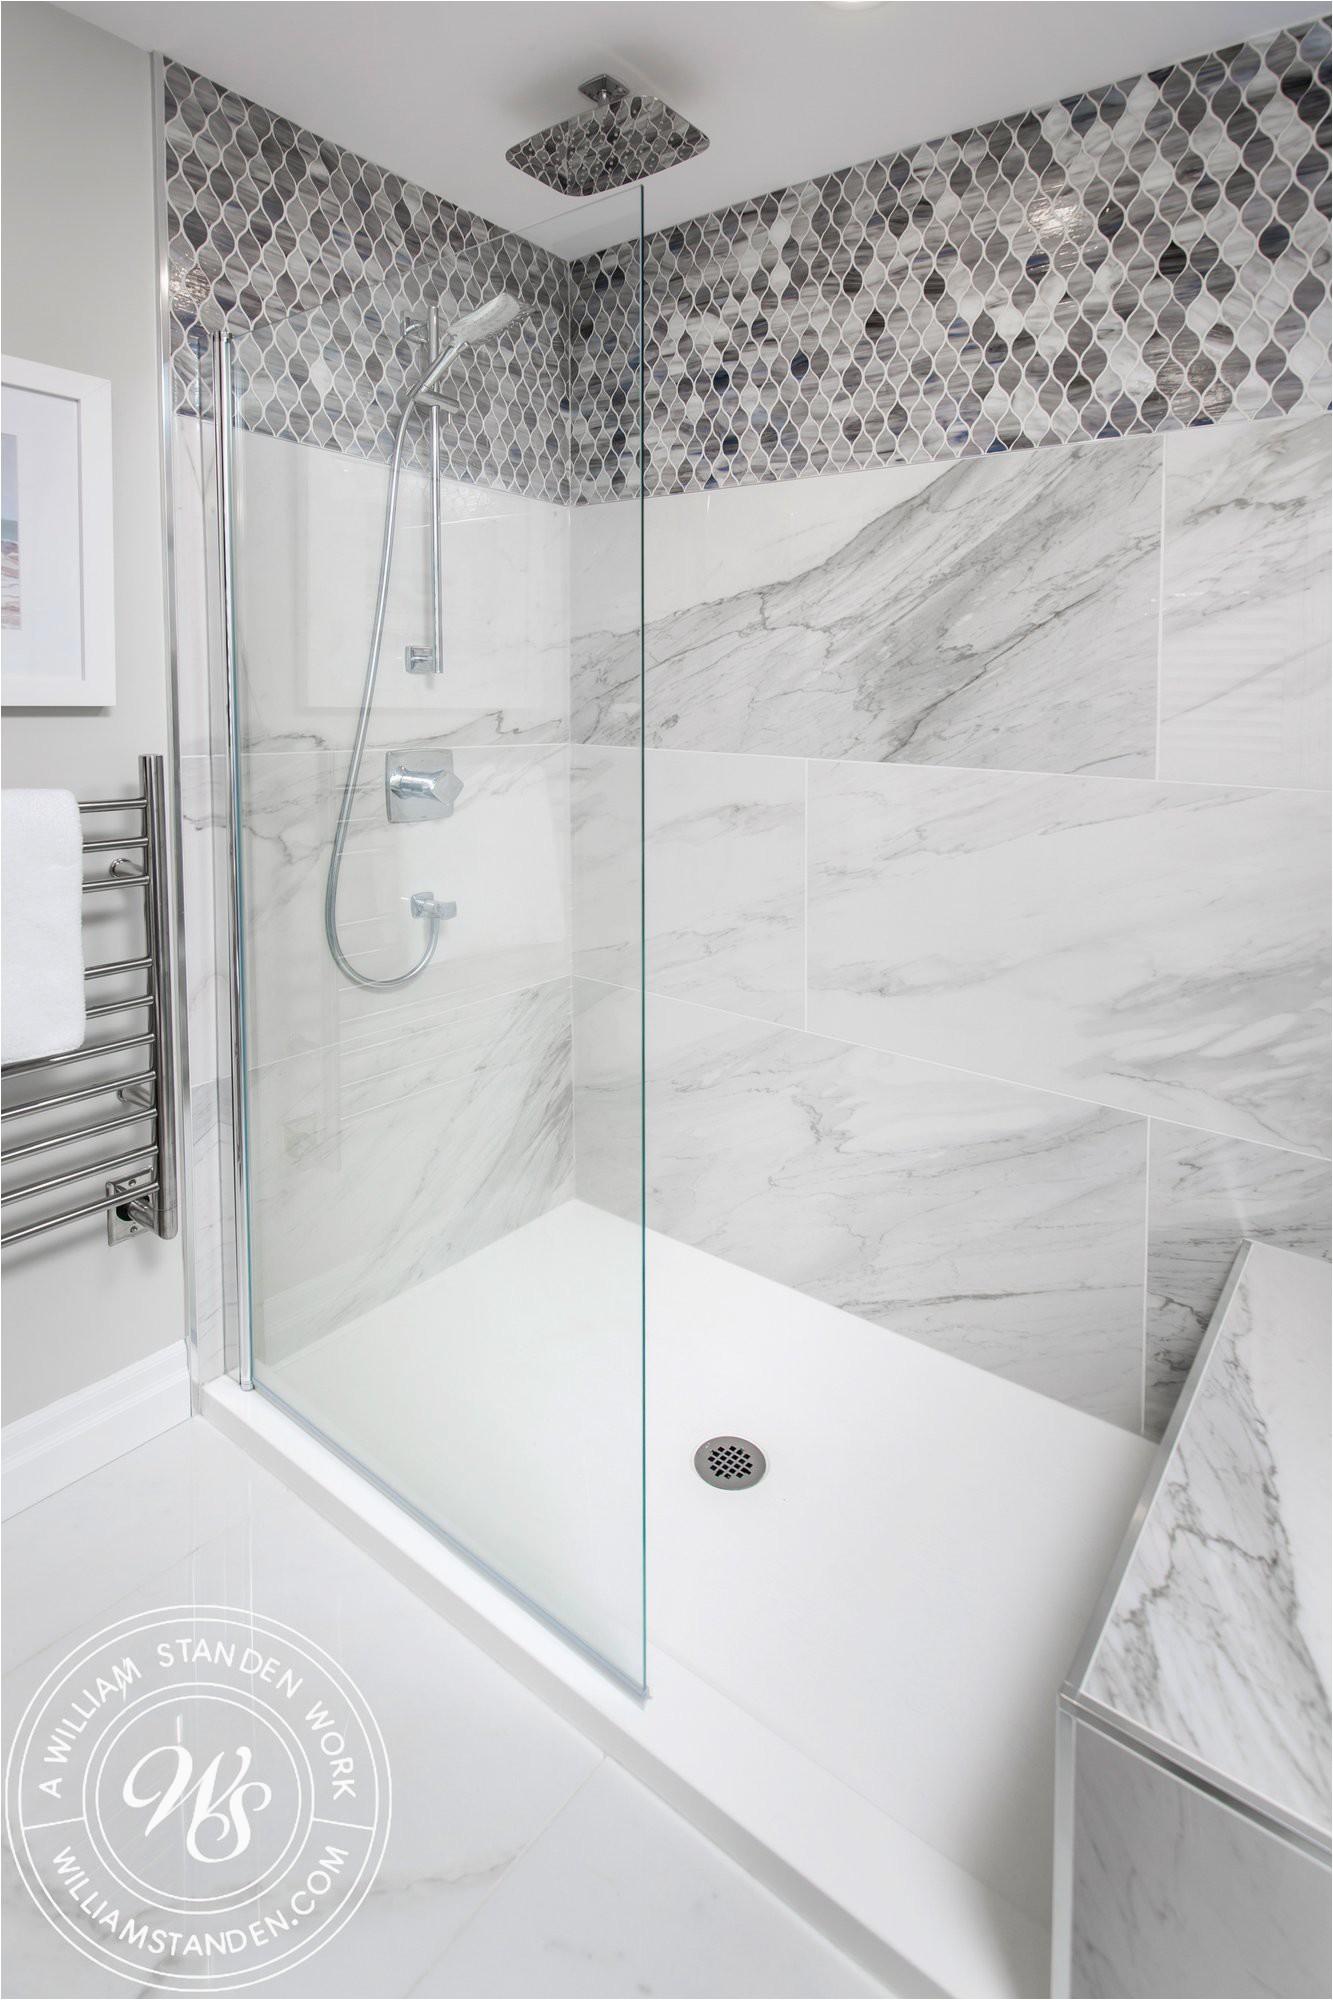 24 x 48 polished marble tile